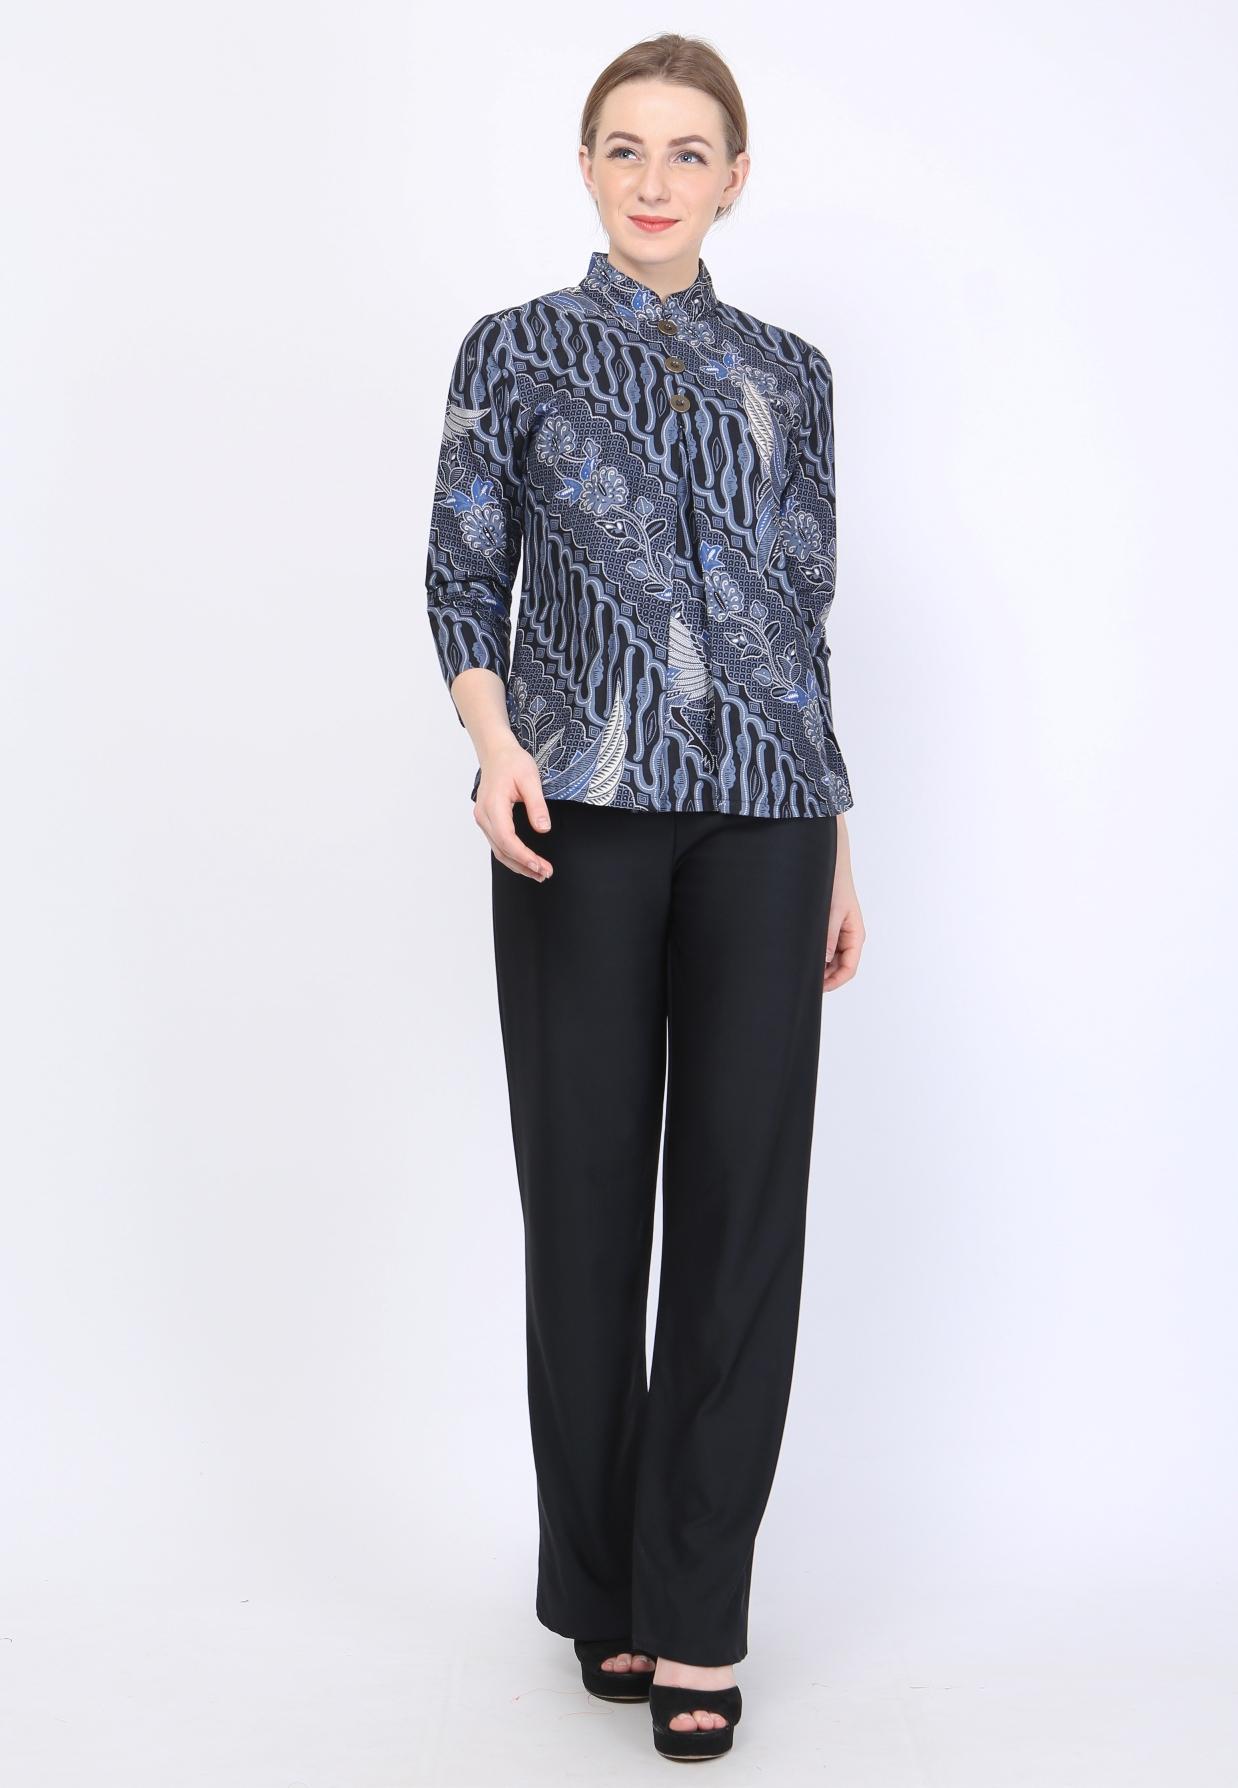 Buy Sell Cheapest Zahra Blouse Best Quality Product Deals Baju Atasan Wanita Keisha Adinata Batik Adelle Lengan Panjang